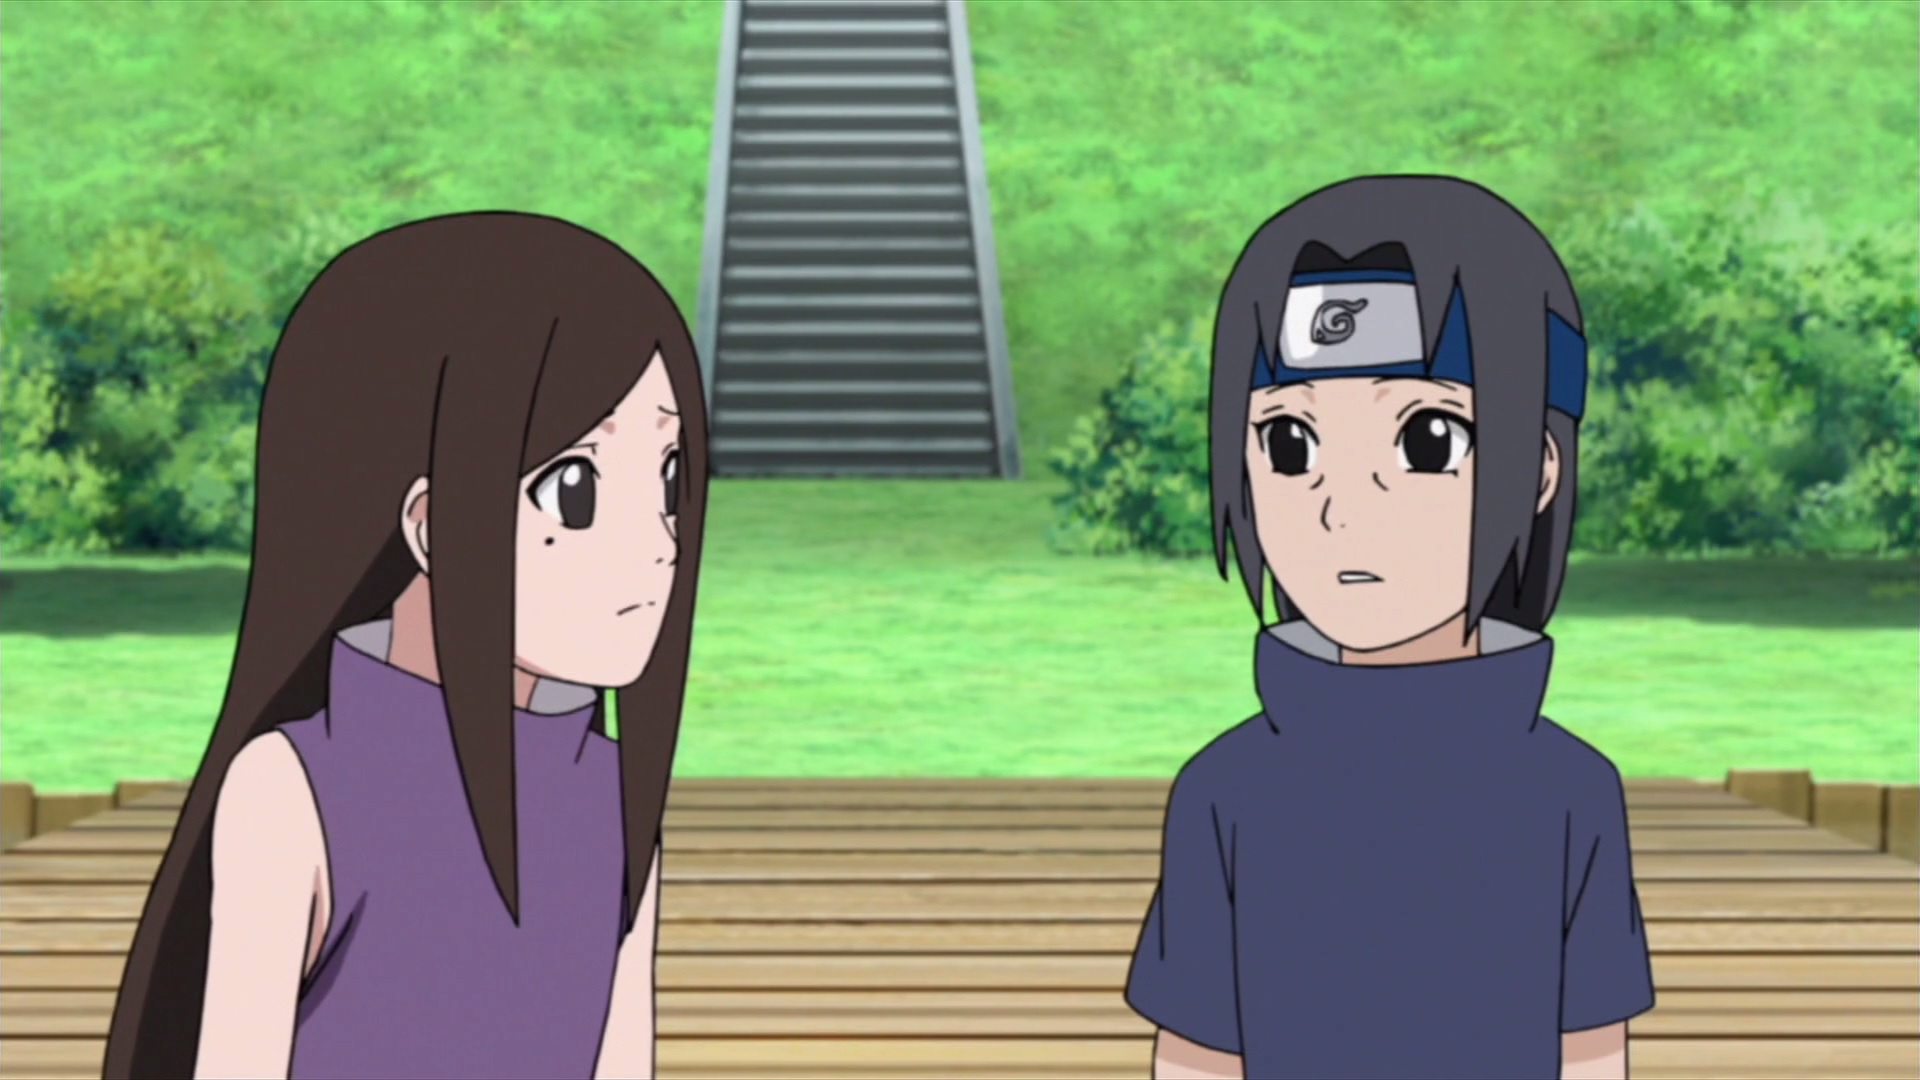 Izumi and Itachi | Daily Anime Art